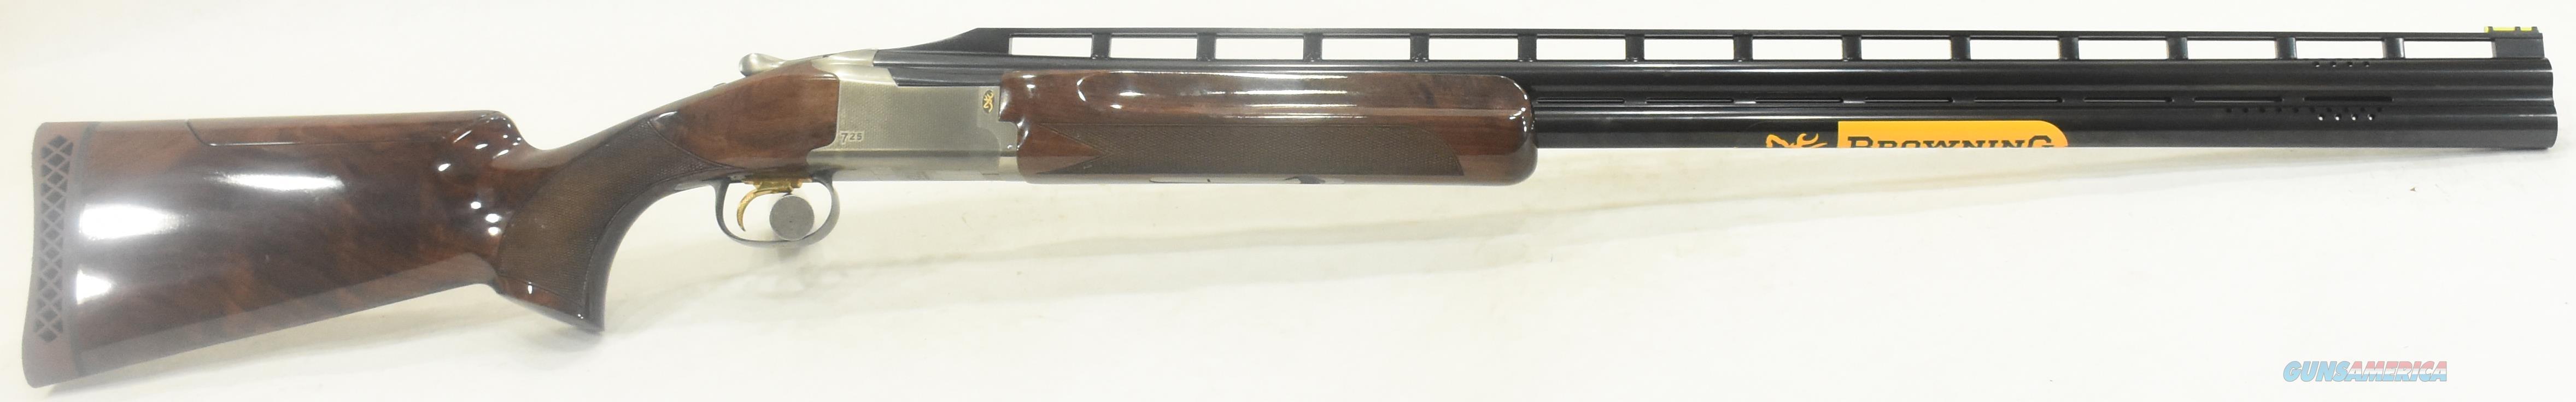 Citori 725 Trap Adj Comb 12Ga 32-2.75In 0135803009  Guns > Shotguns > Browning Shotguns > Over Unders > Citori > Trap/Skeet